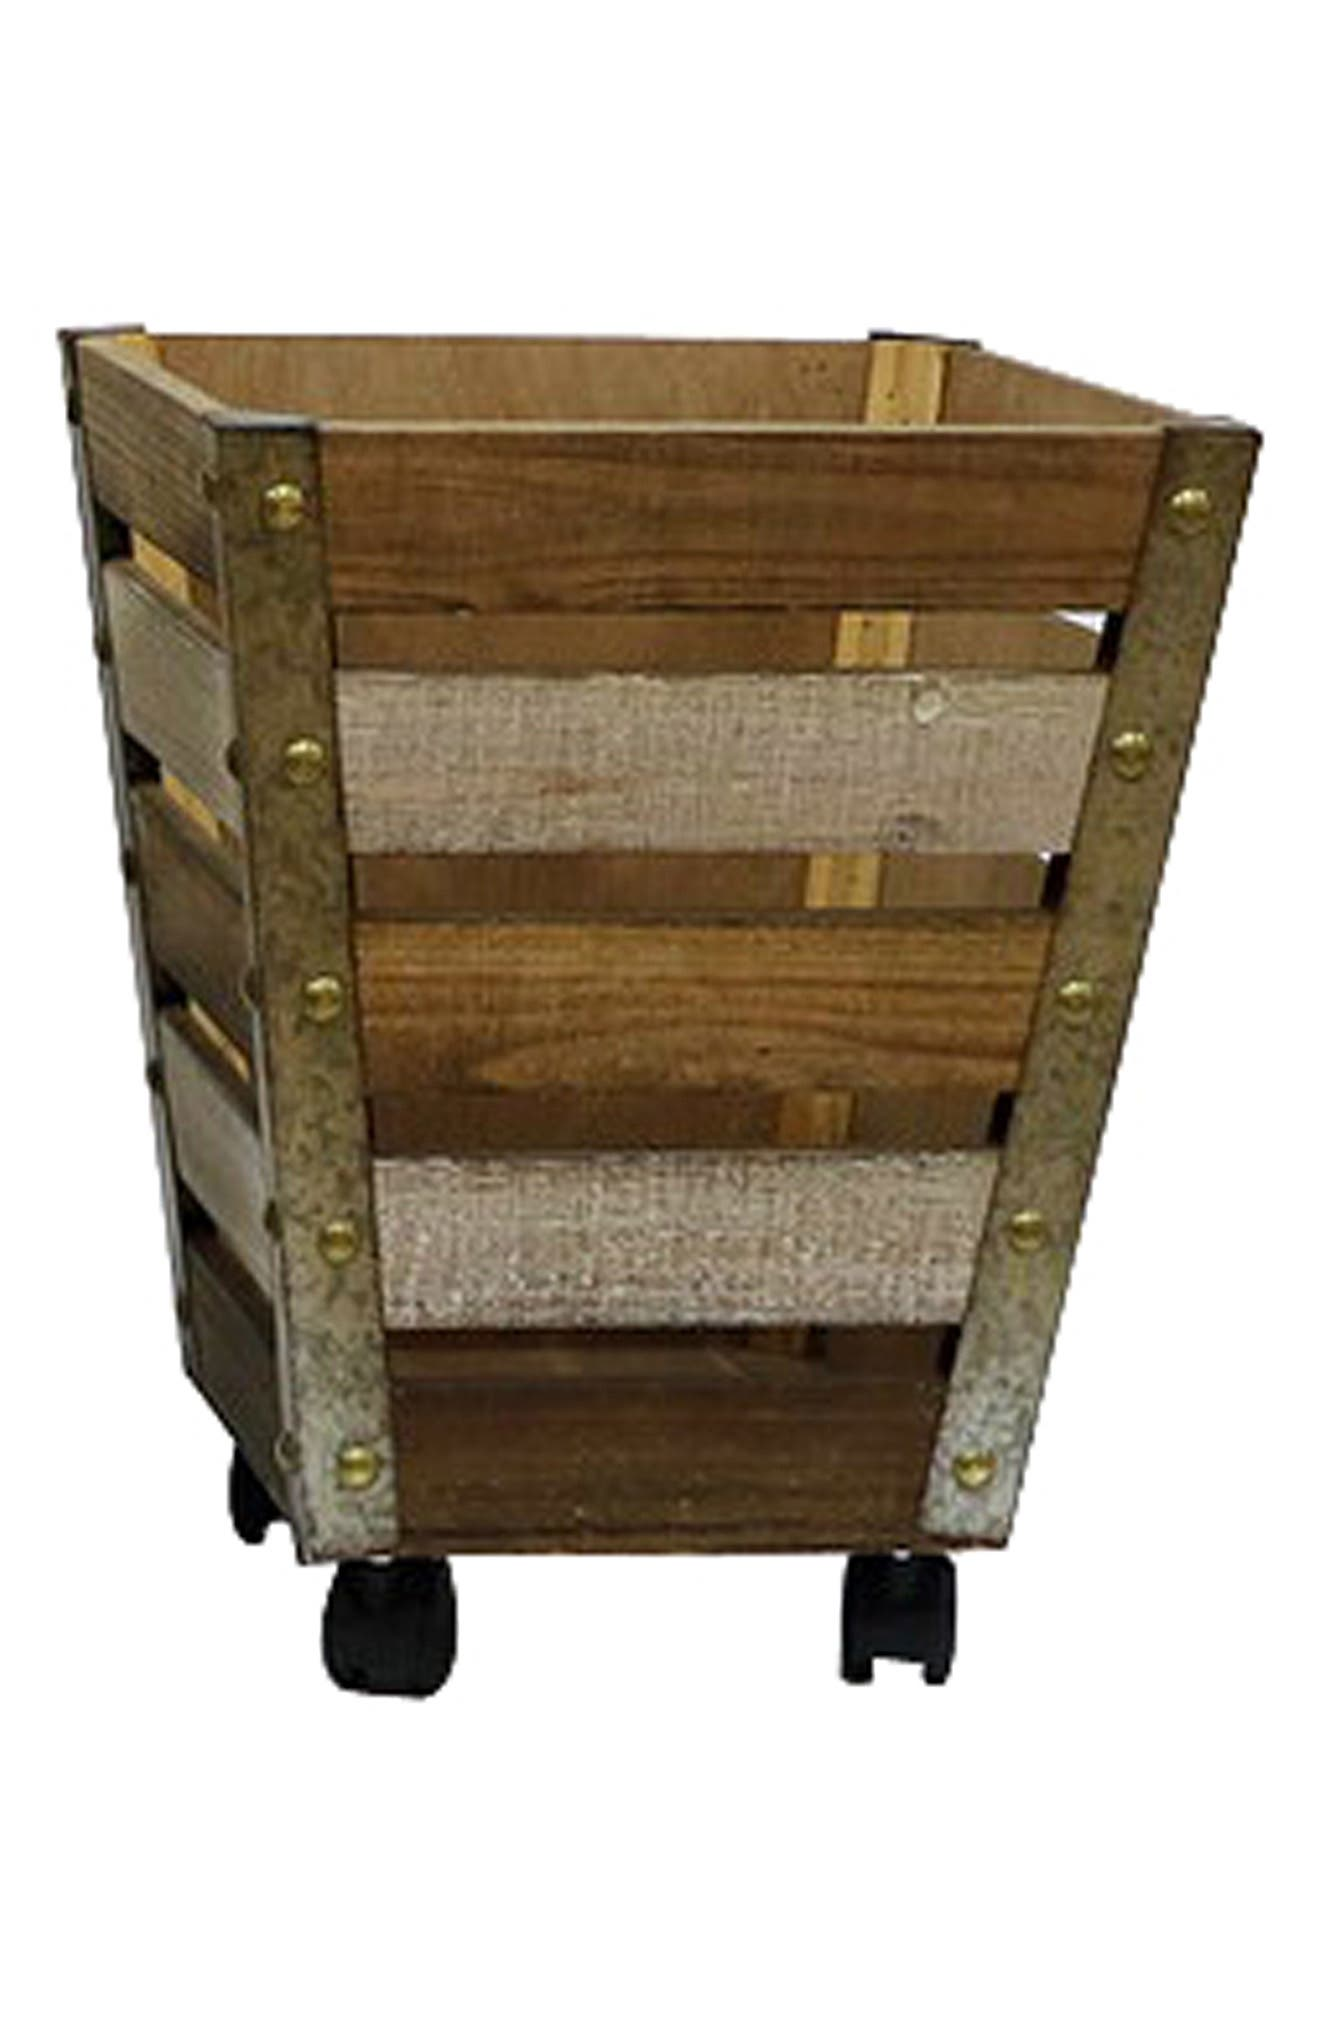 Main Image - Crystal Art Gallery Wheeled Wooden Basket